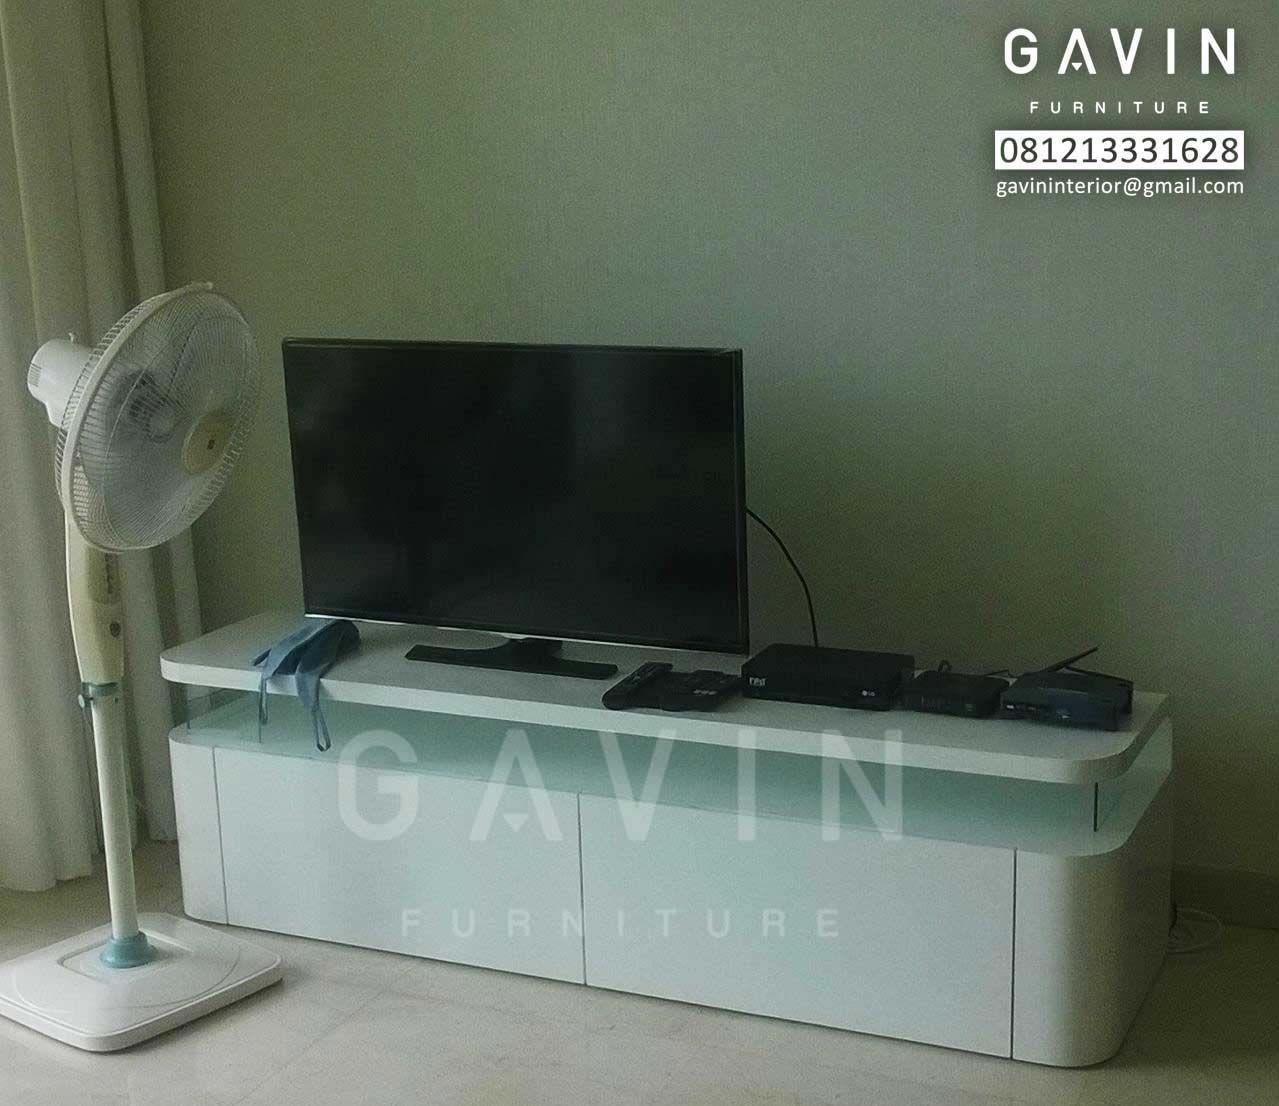 Pembuatan Berbagai Furniture Custom Di Gavin Furniture Credenza Tv  # Modele De Meuble De Tele